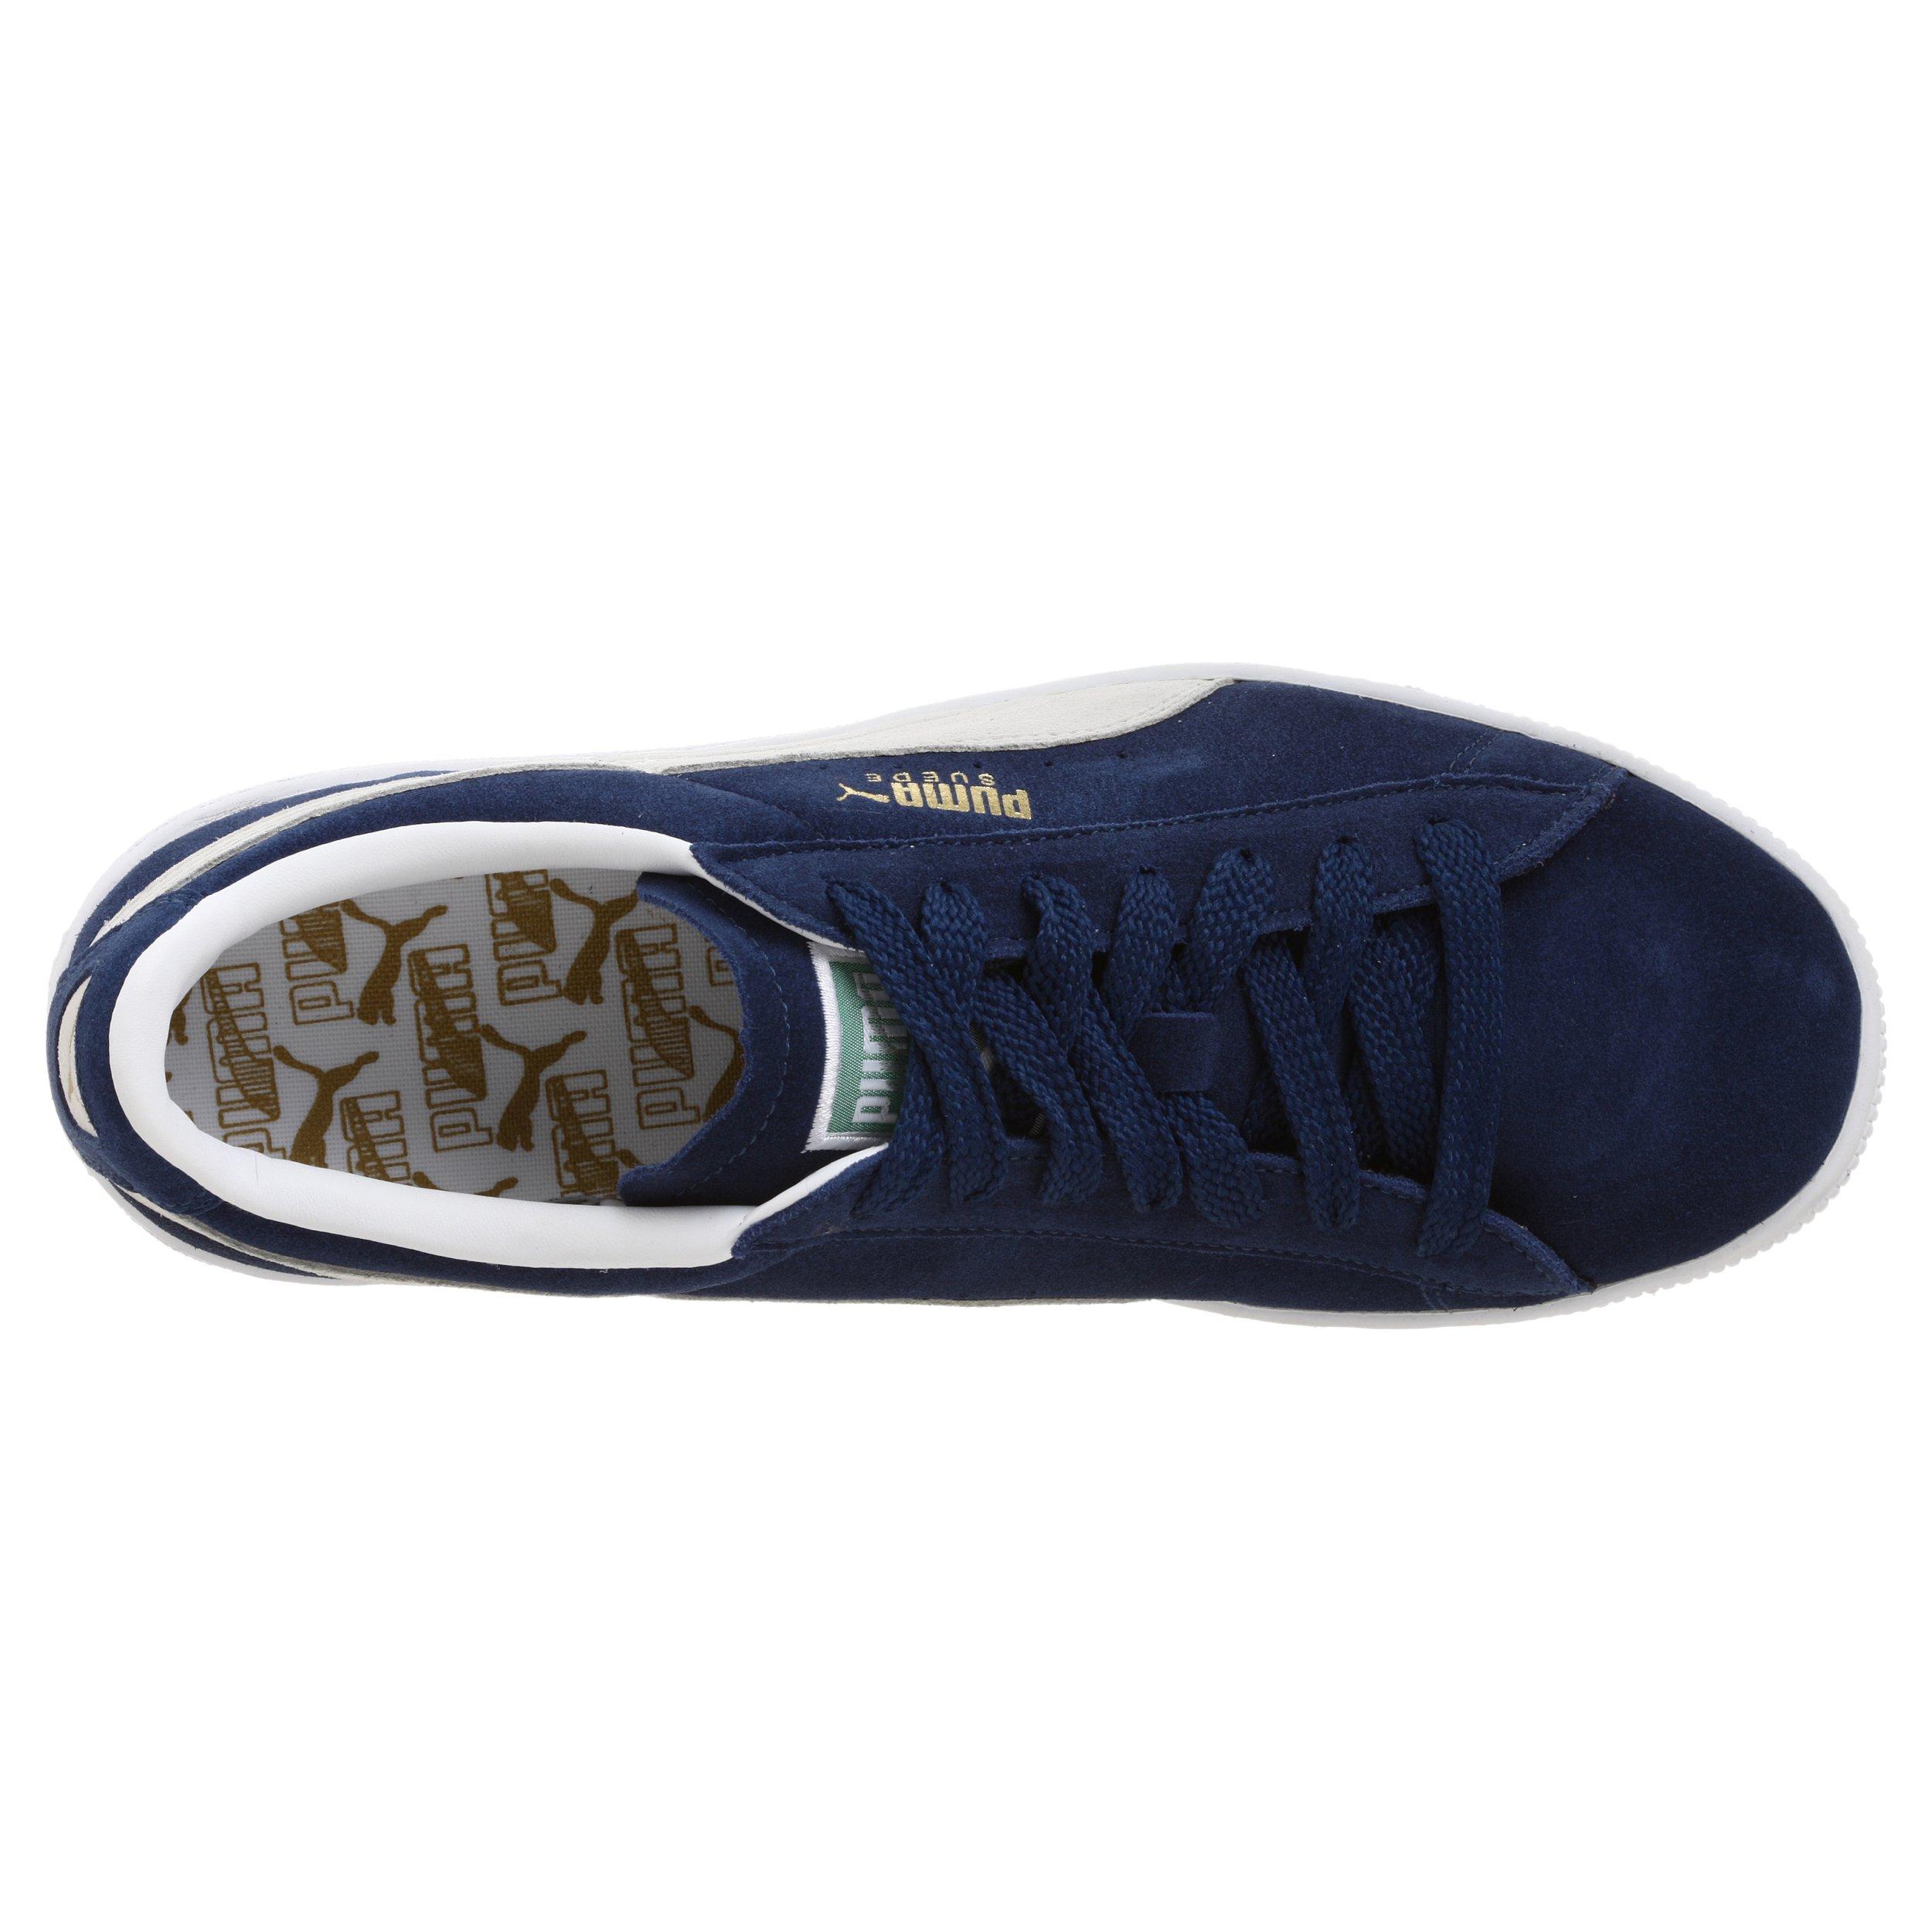 PUMA Suede Classic Sneaker,Blue/White,8 M US Men's by PUMA (Image #7)